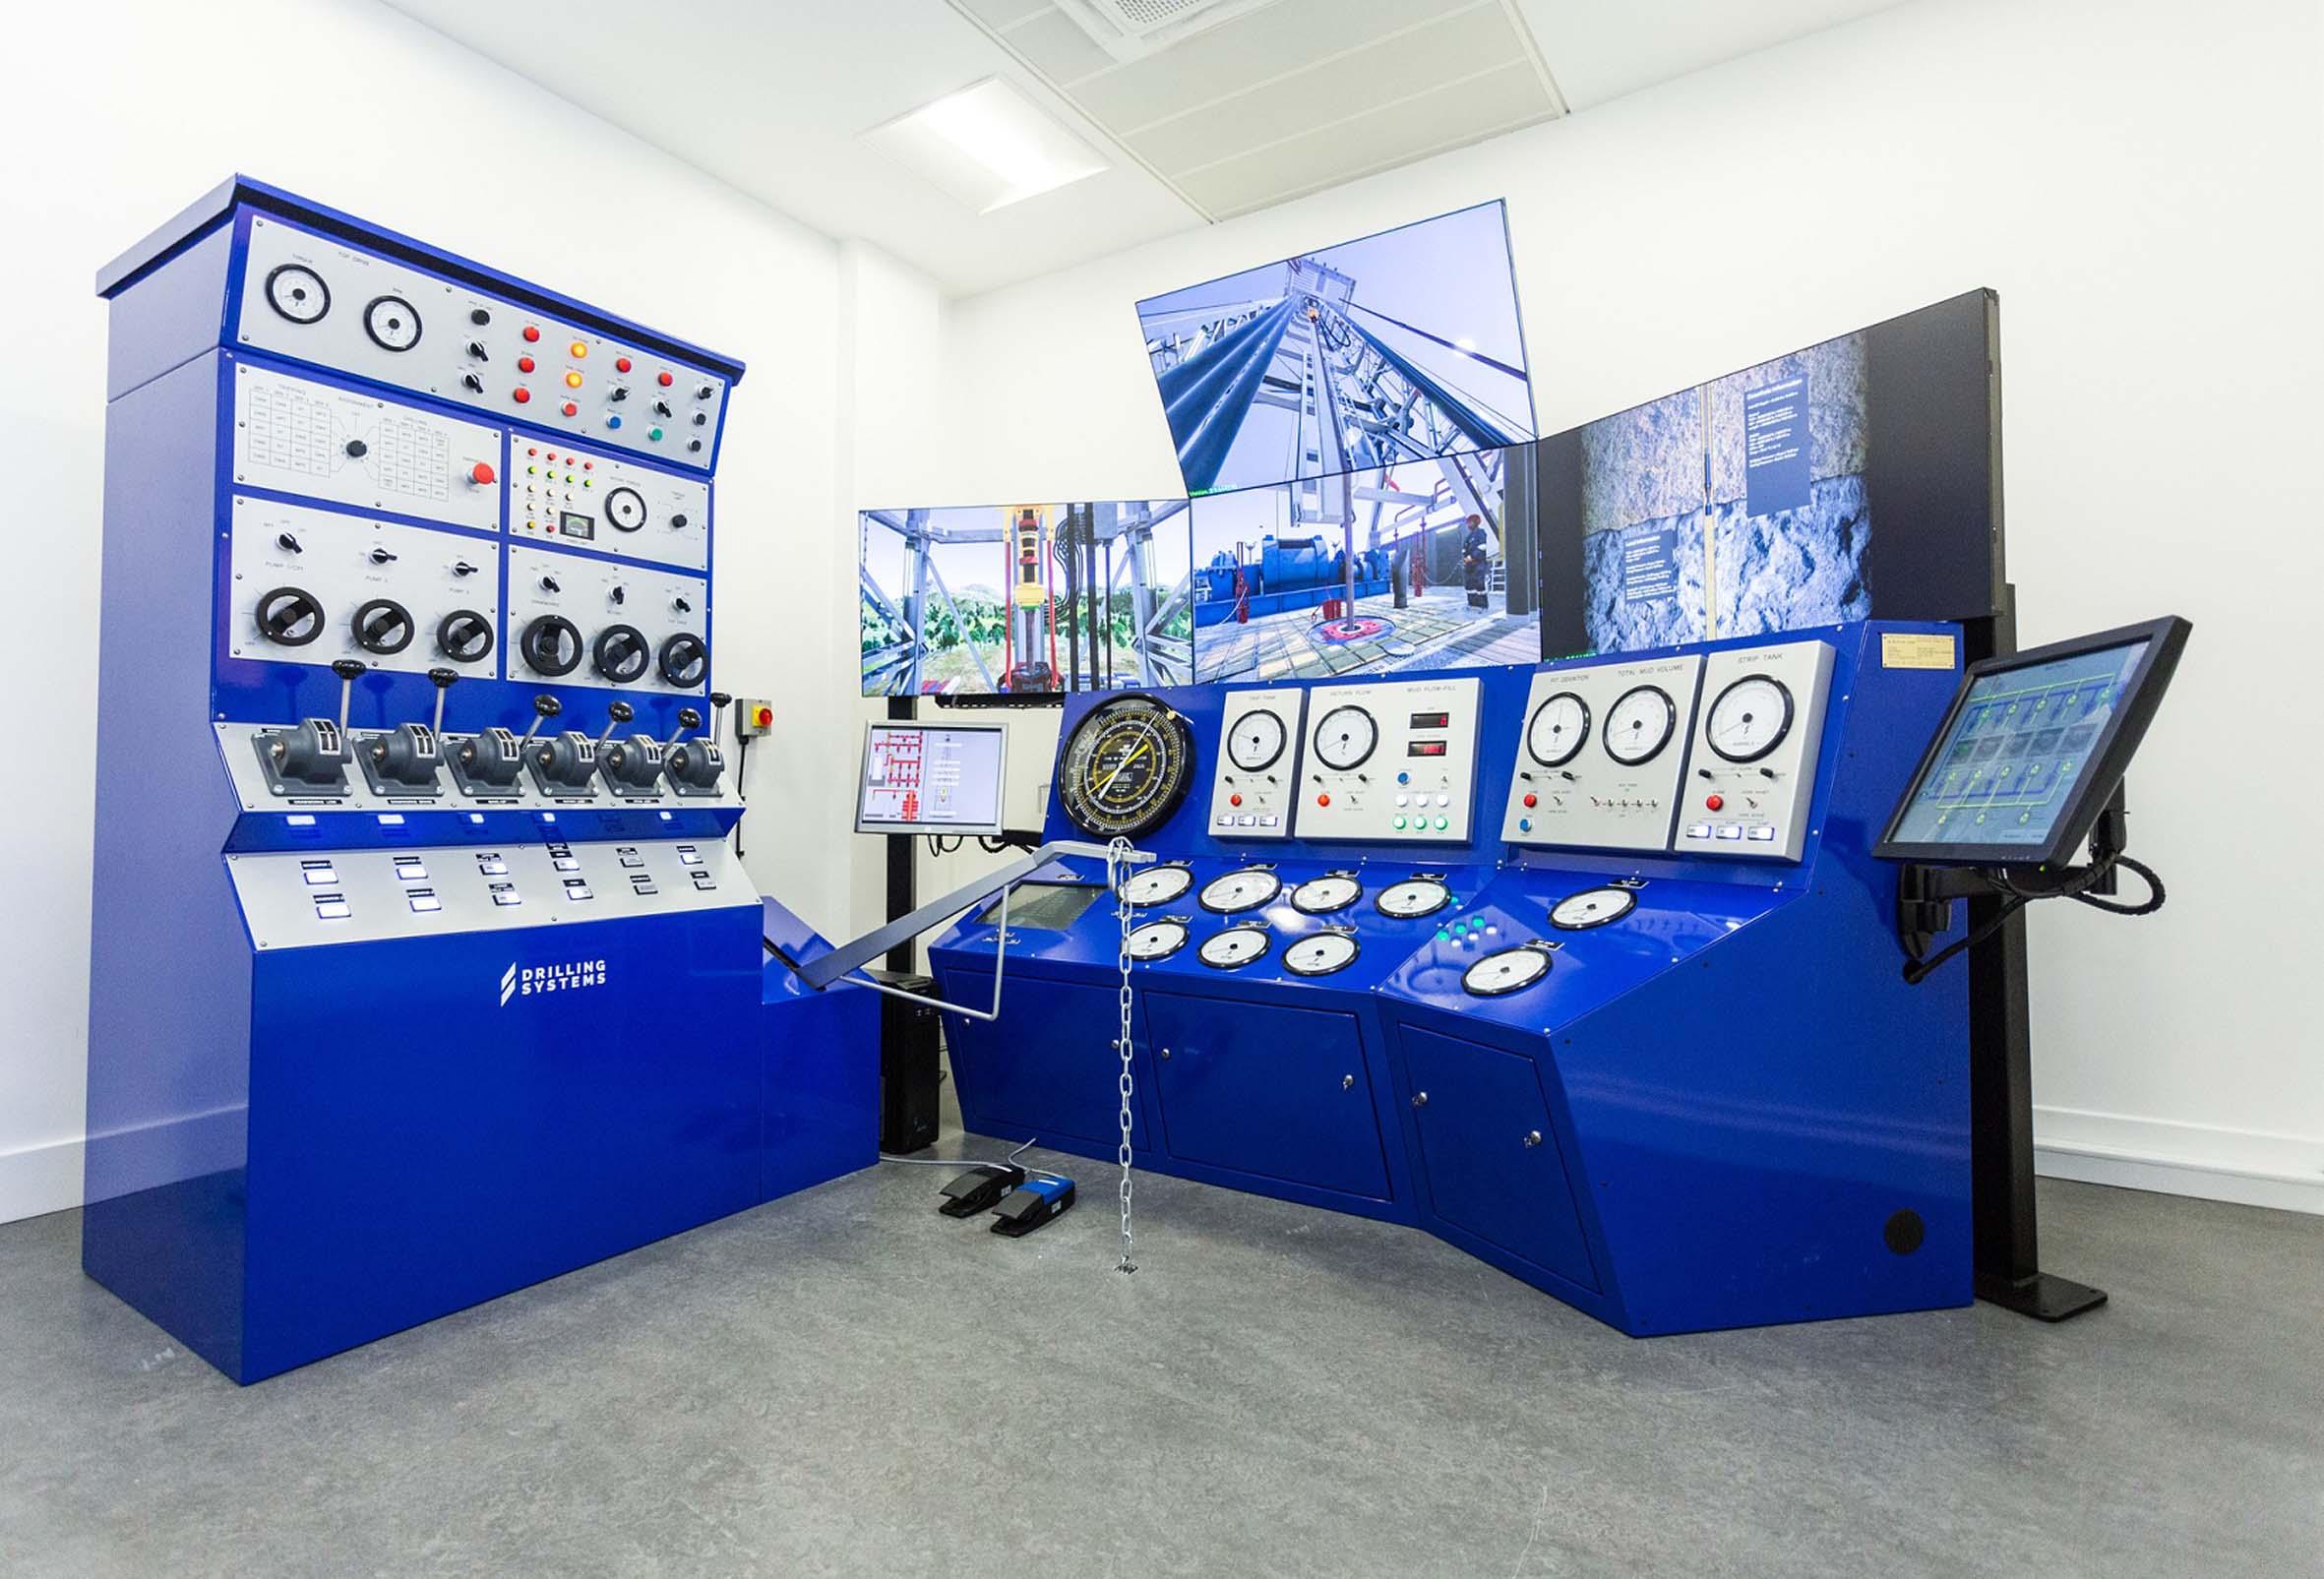 RGU's decommissioning simulator